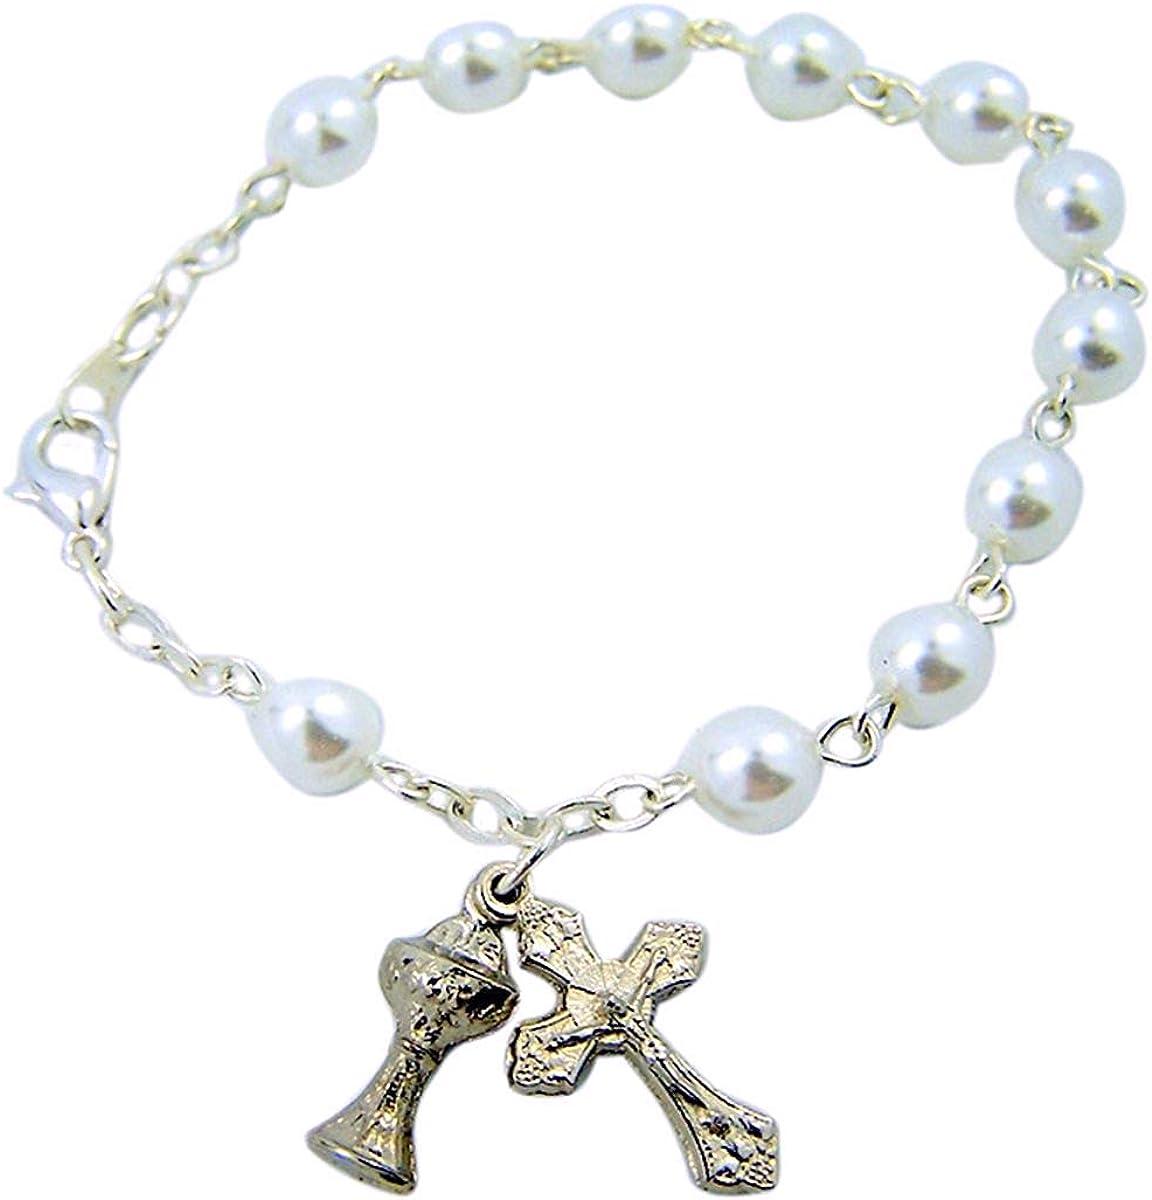 First Communion Gift Rosary Bracelet for Catholic Girls 7 Inch